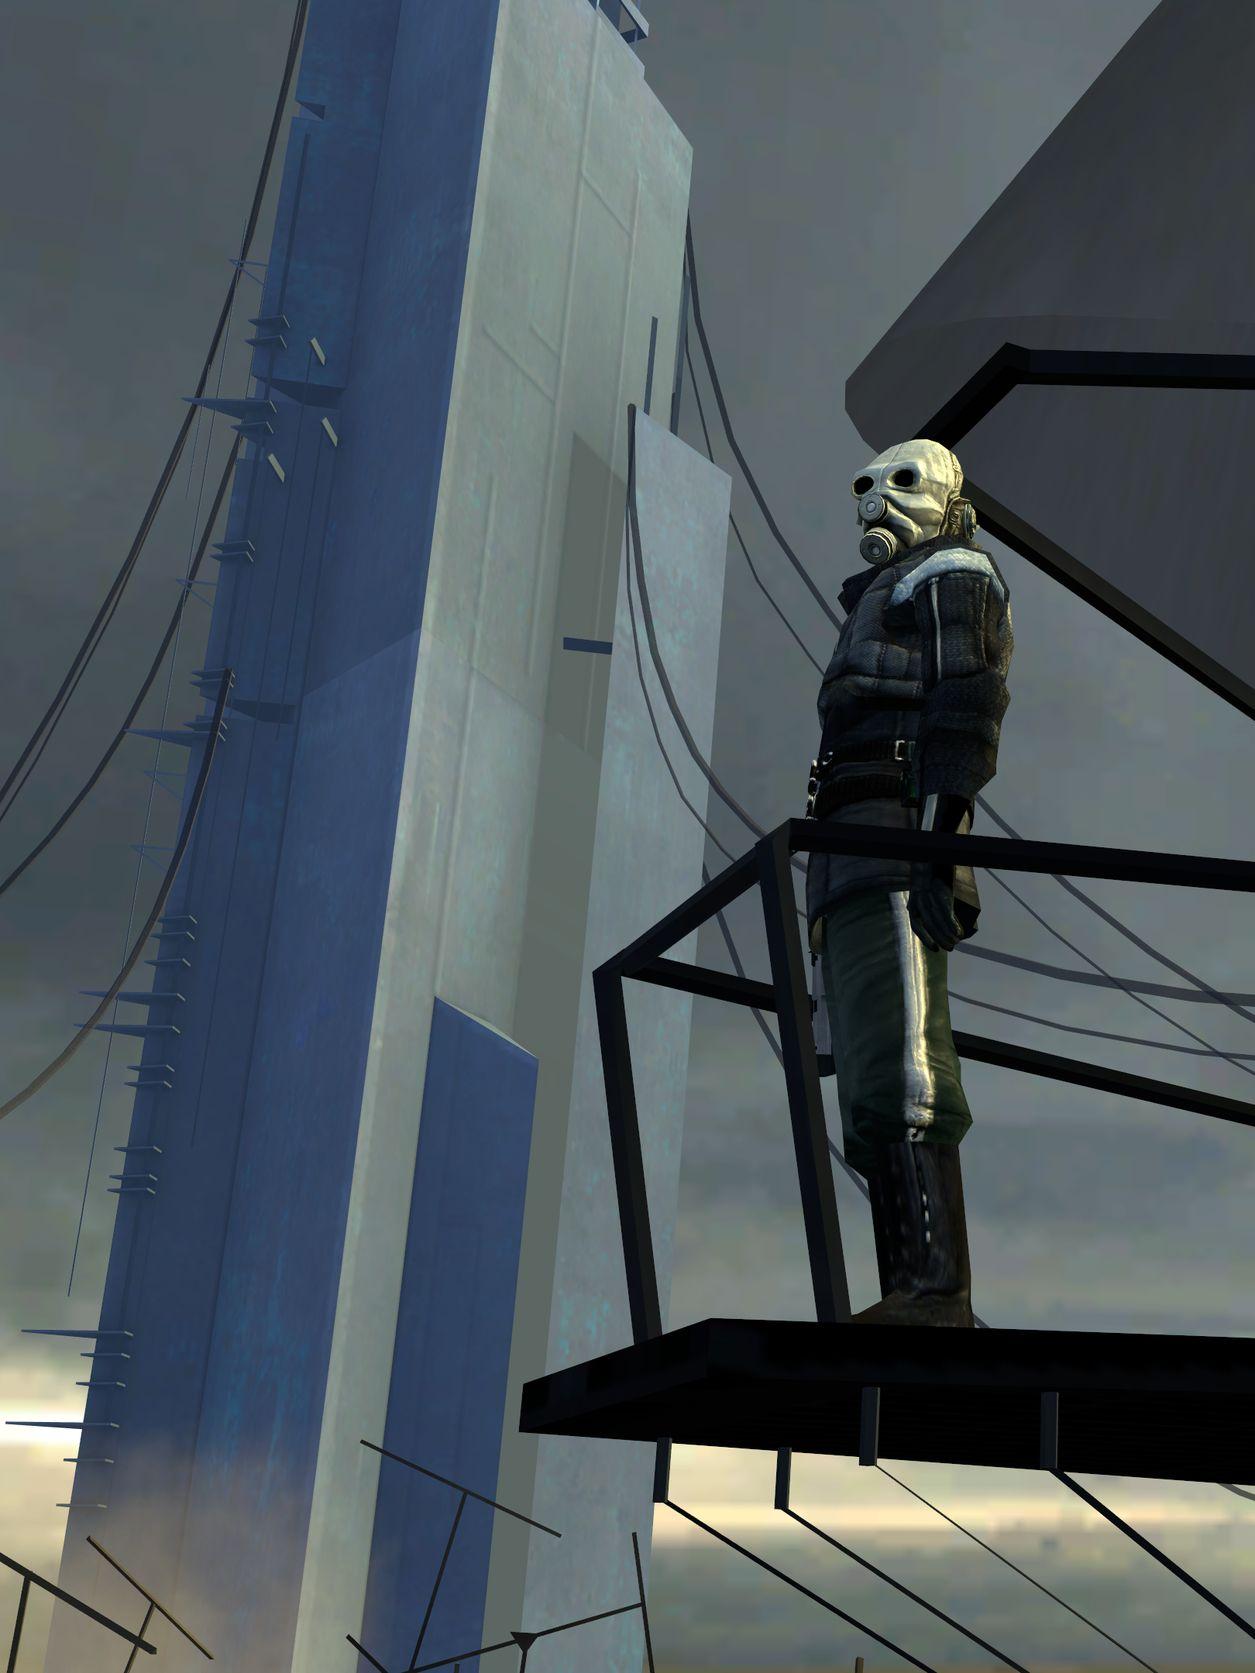 Half Life 2 Valve Corporation Citadel Miniature